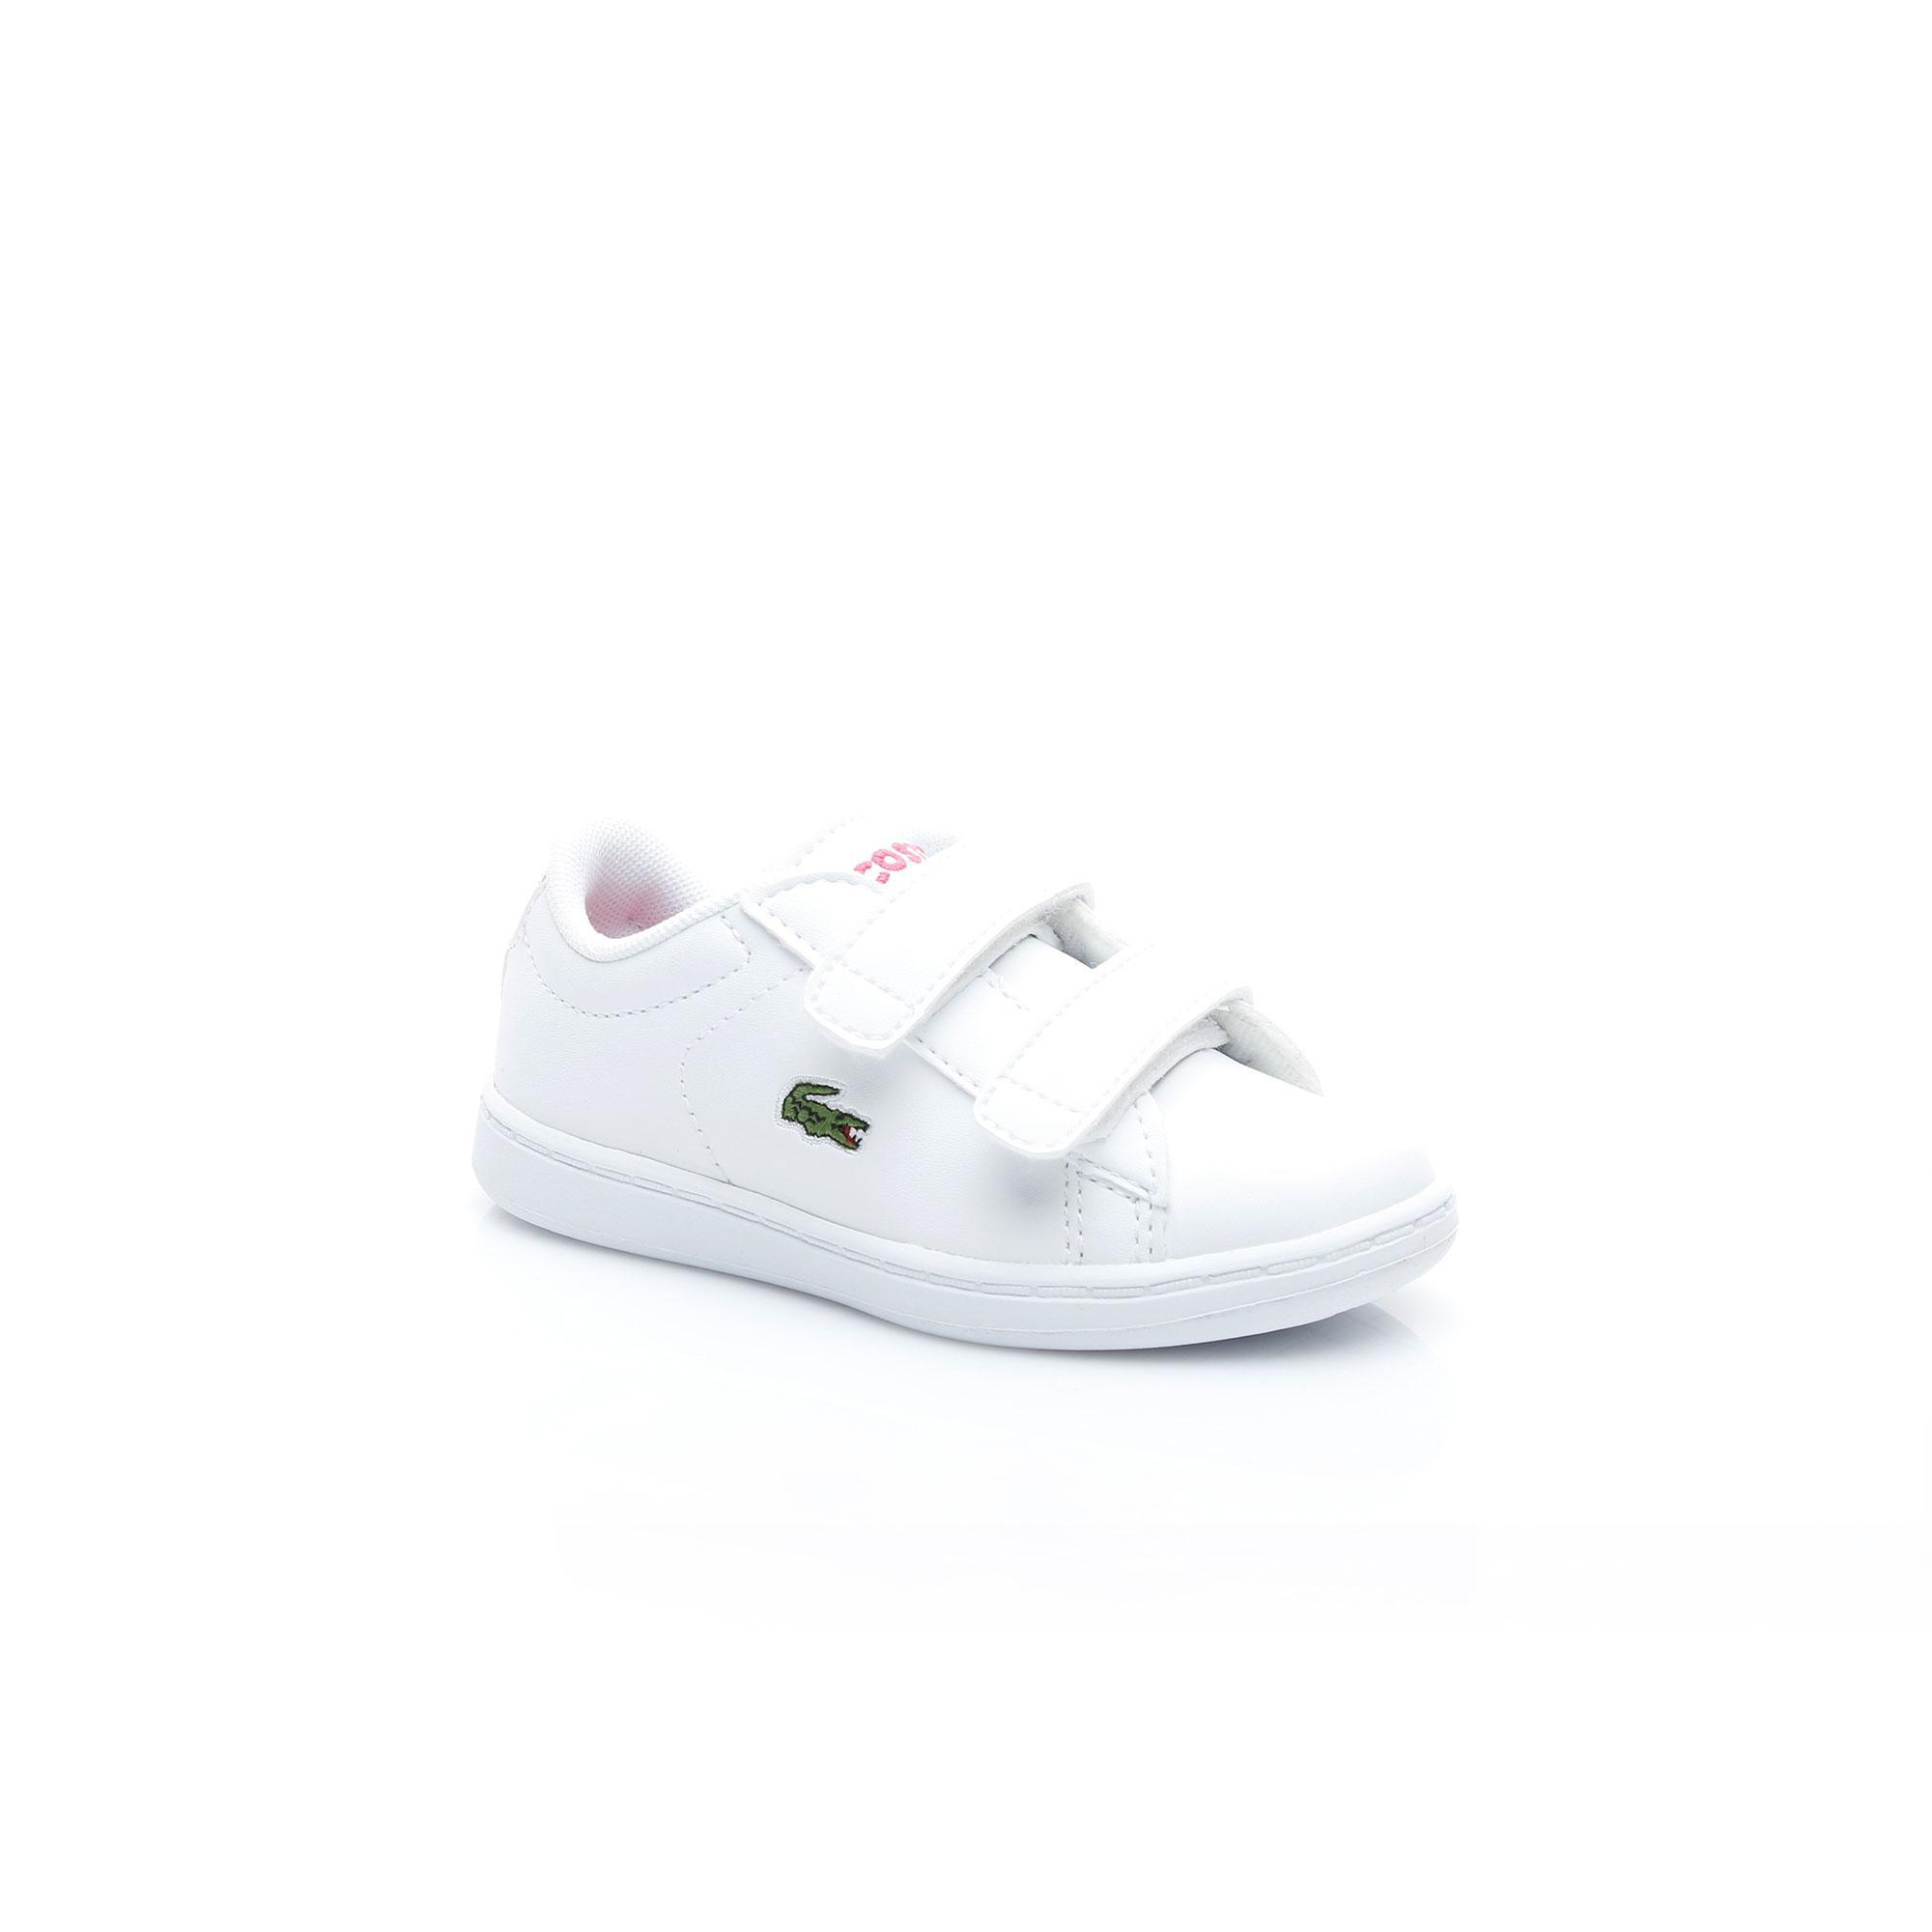 Lacoste Çocuk Carnaby Evo BL 1 Beyaz Sneaker